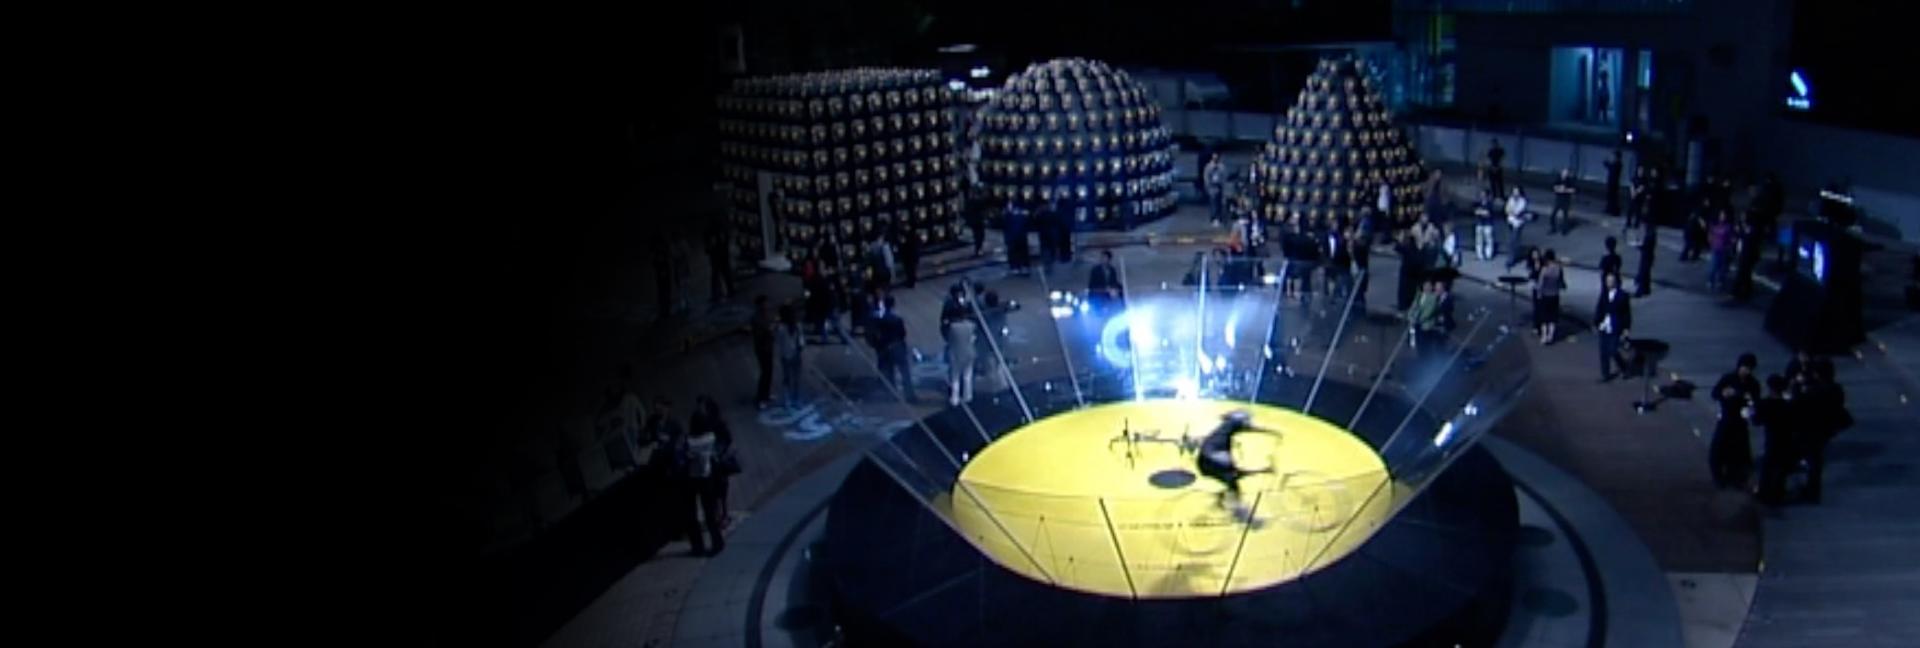 Interior shot of the Velodrome event